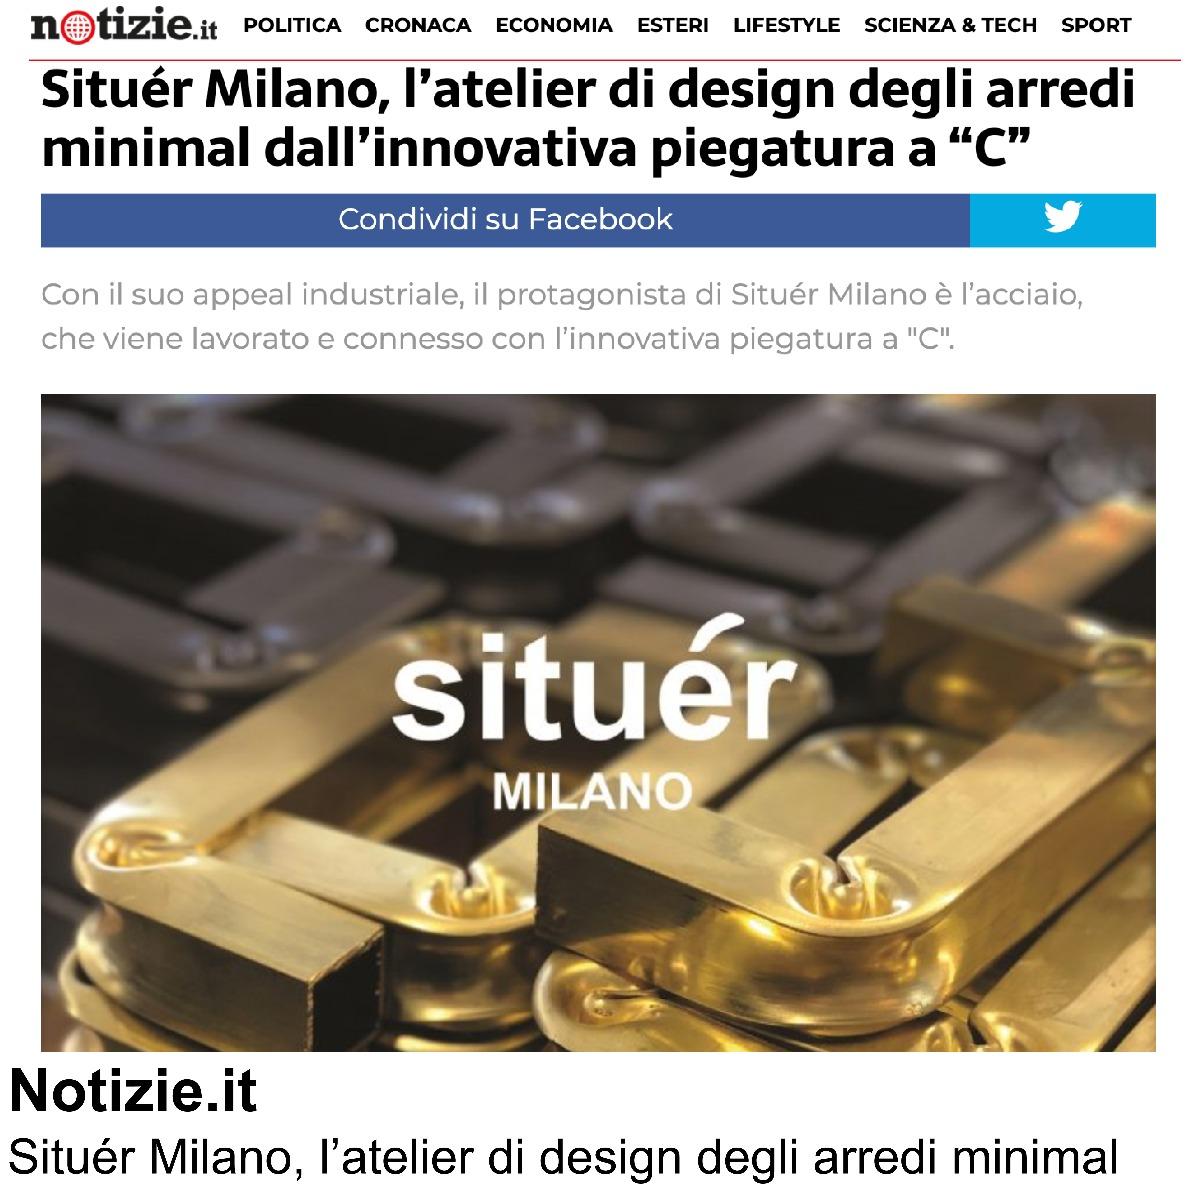 situèr milano su notizie.it